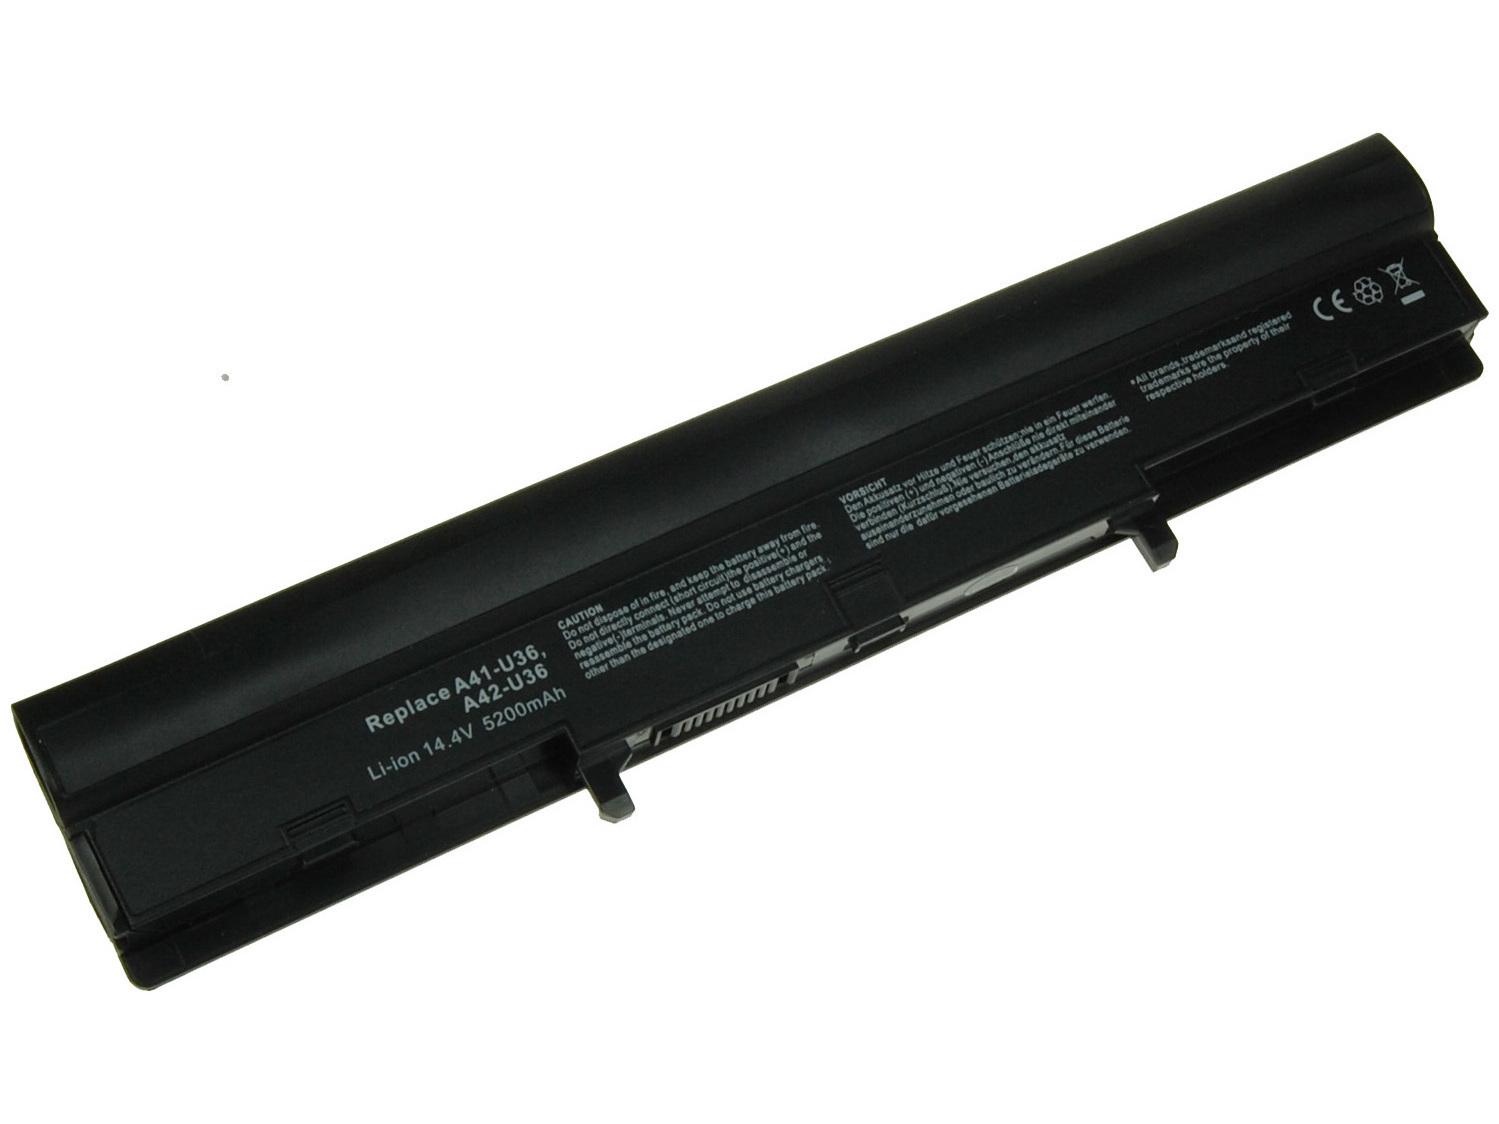 Baterie AVACOM NOAS-U36H-S26 pro Asus U36, U82, X32 Li-Ion 14,8V 5200mAh